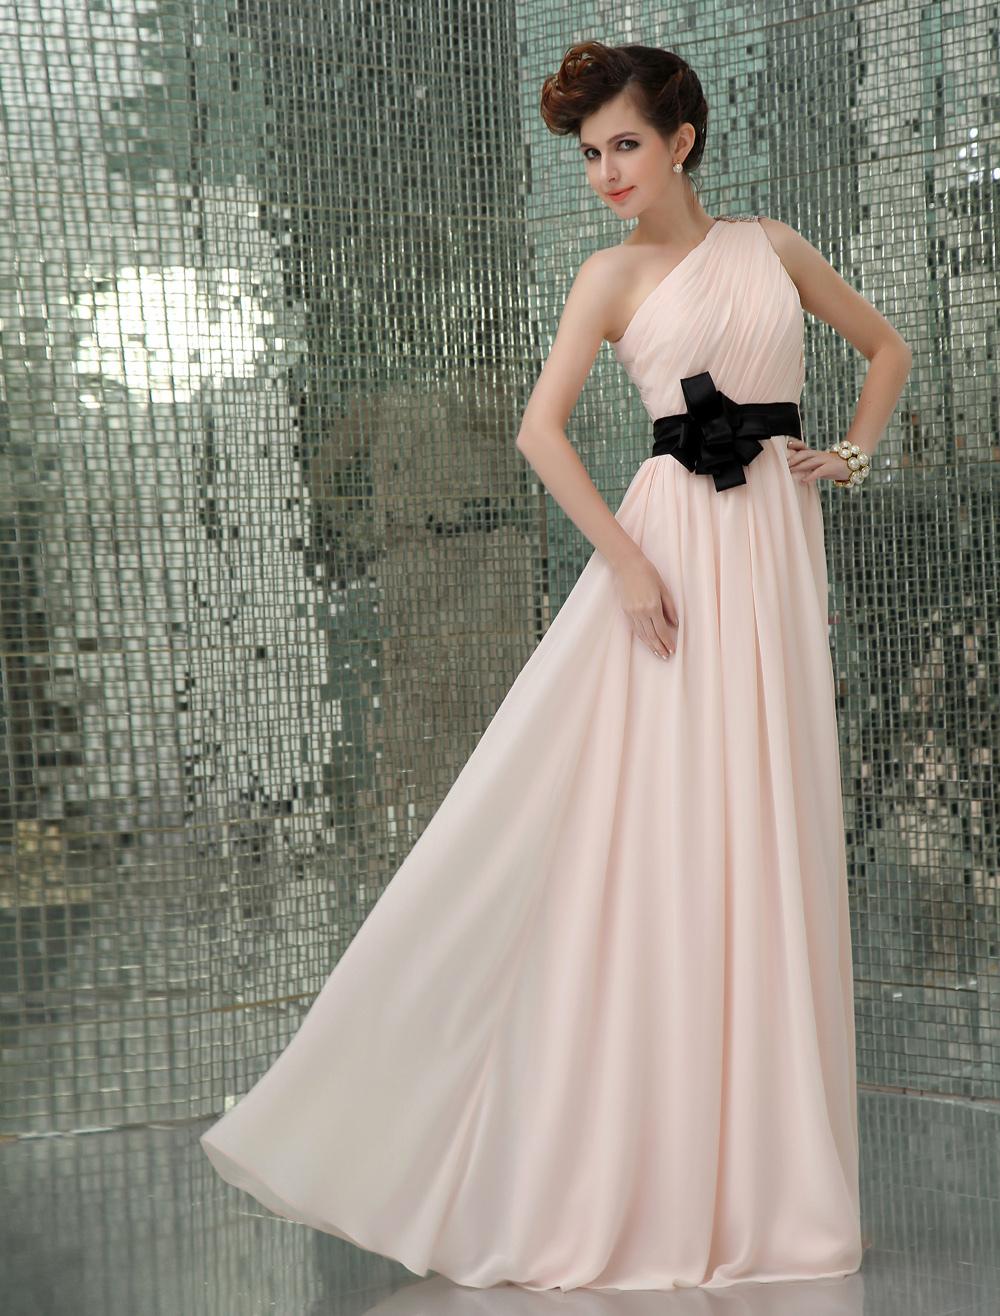 One-Shoulder Sash Evening Dress Wedding Guest Dress (Evening Dresses) photo